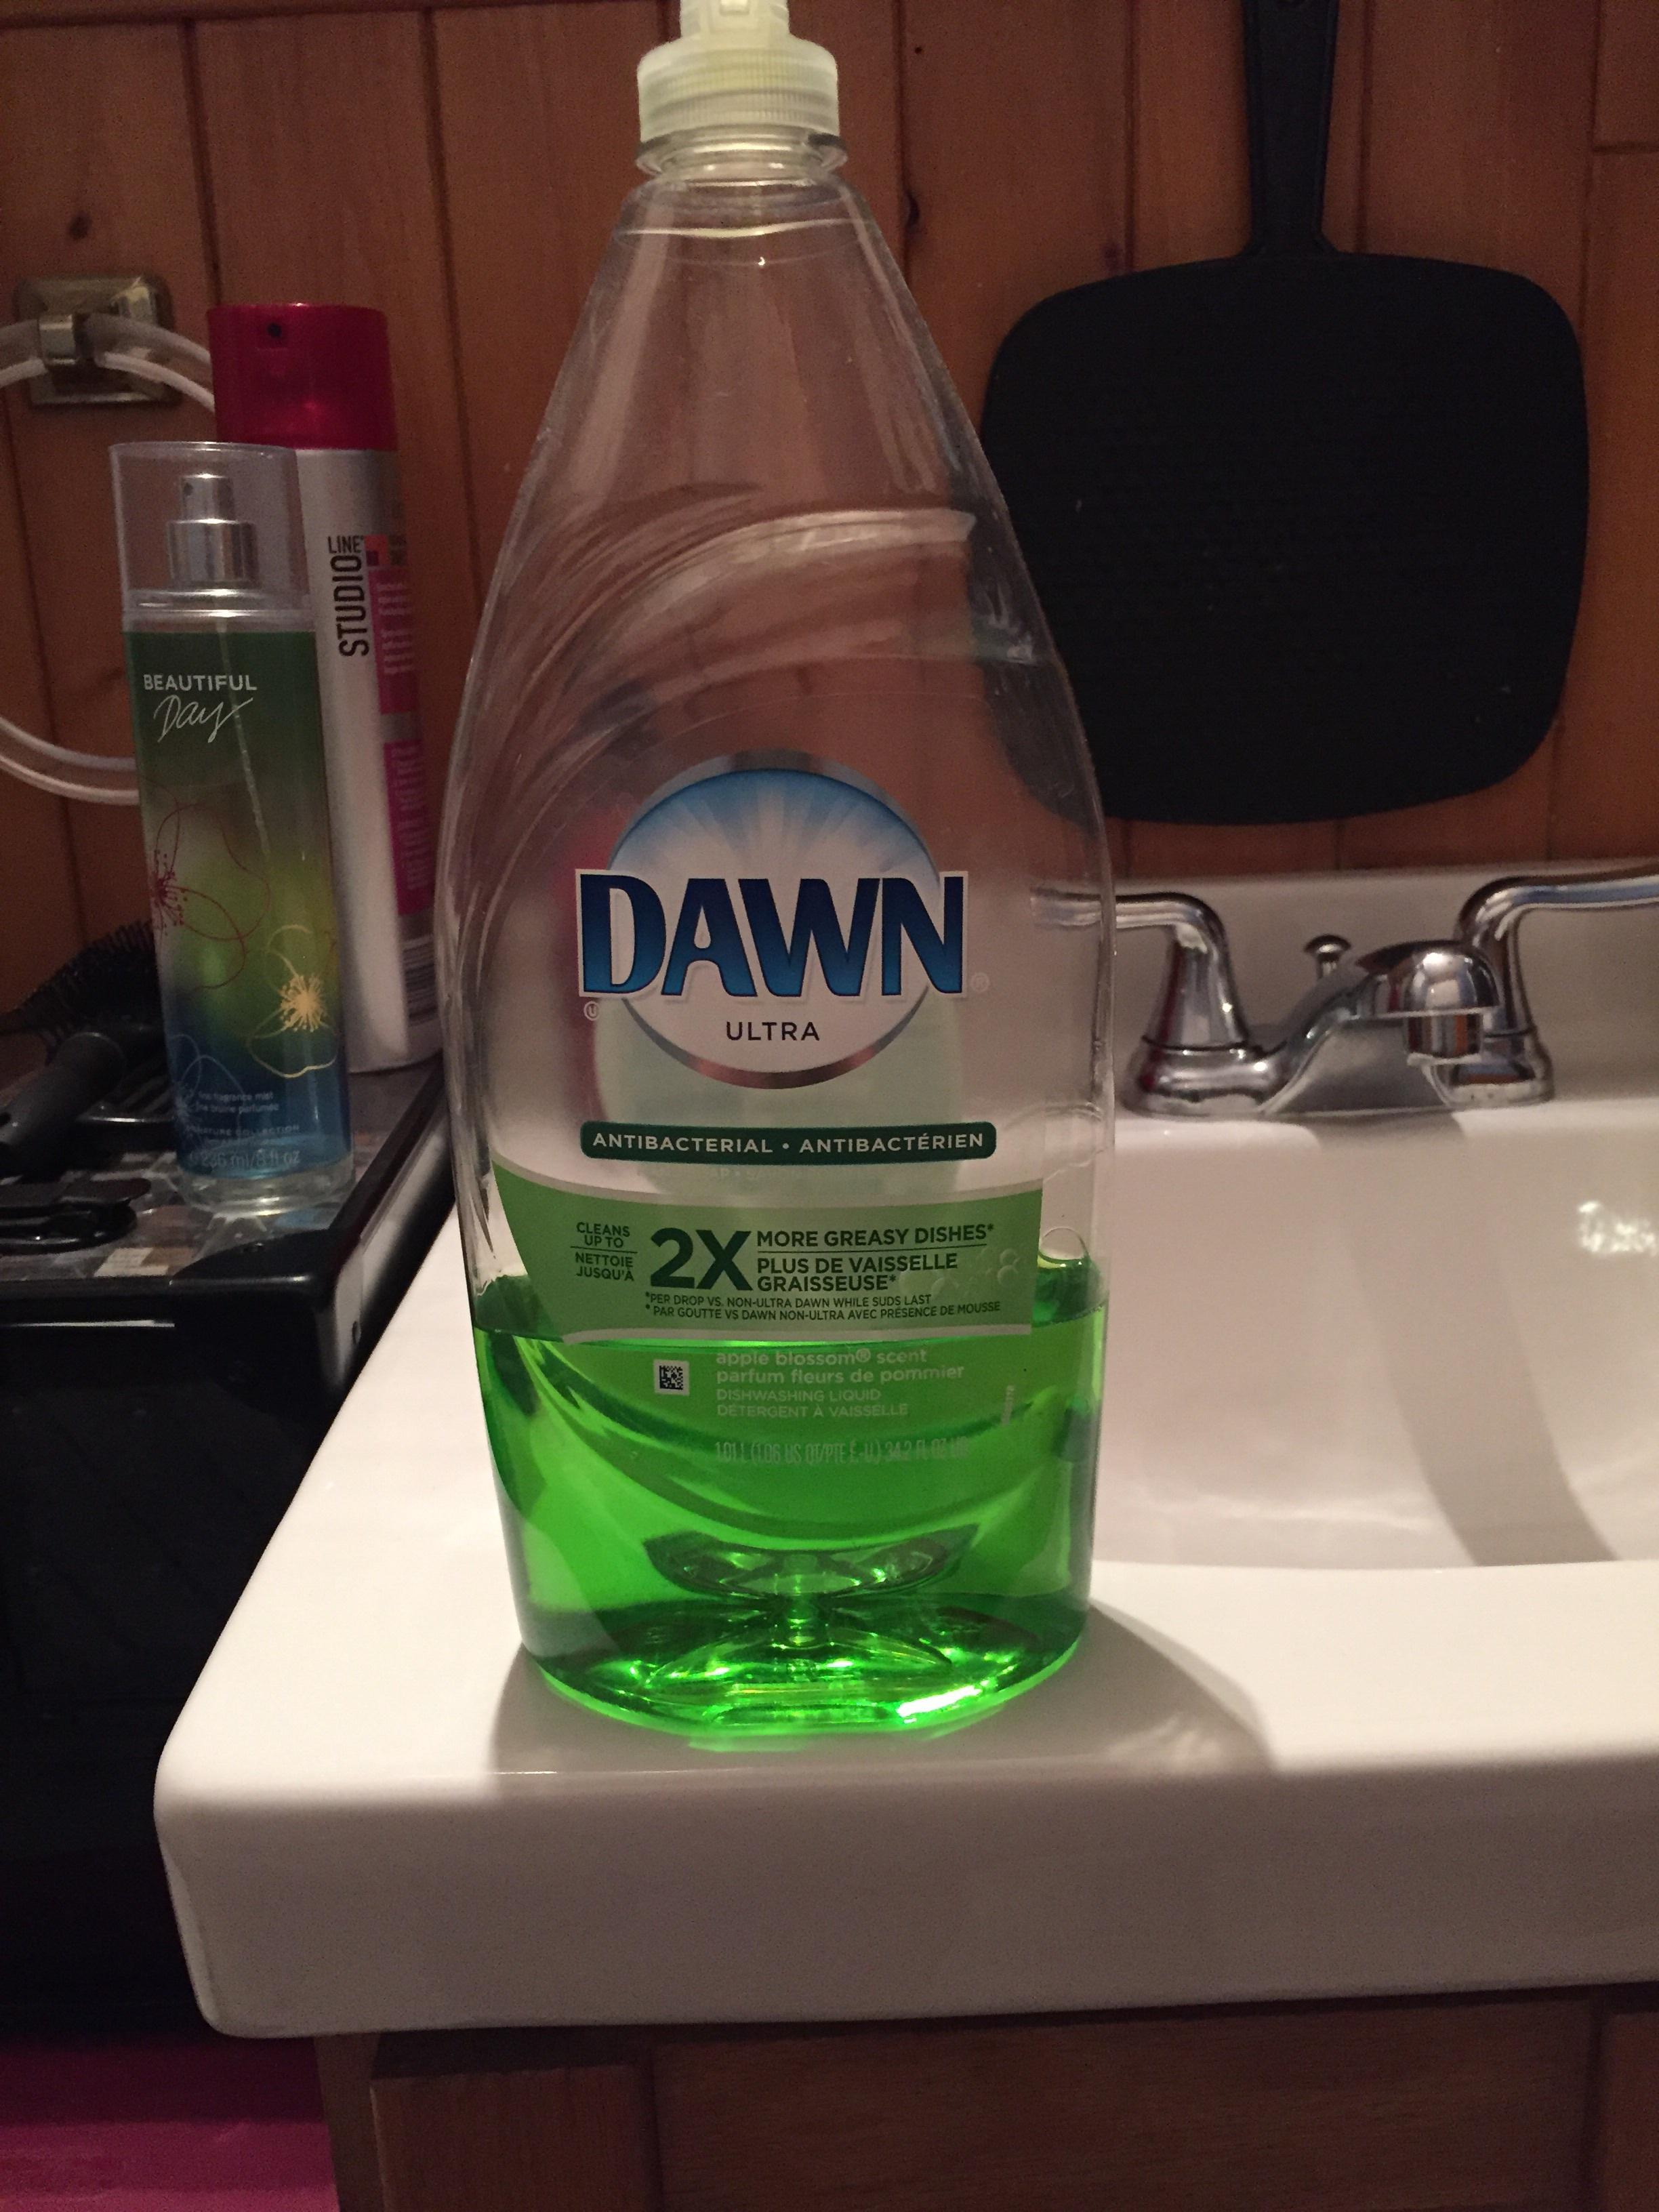 Dawn Ultra Antibacterial Dishwashing Liquid, Apple Blossom